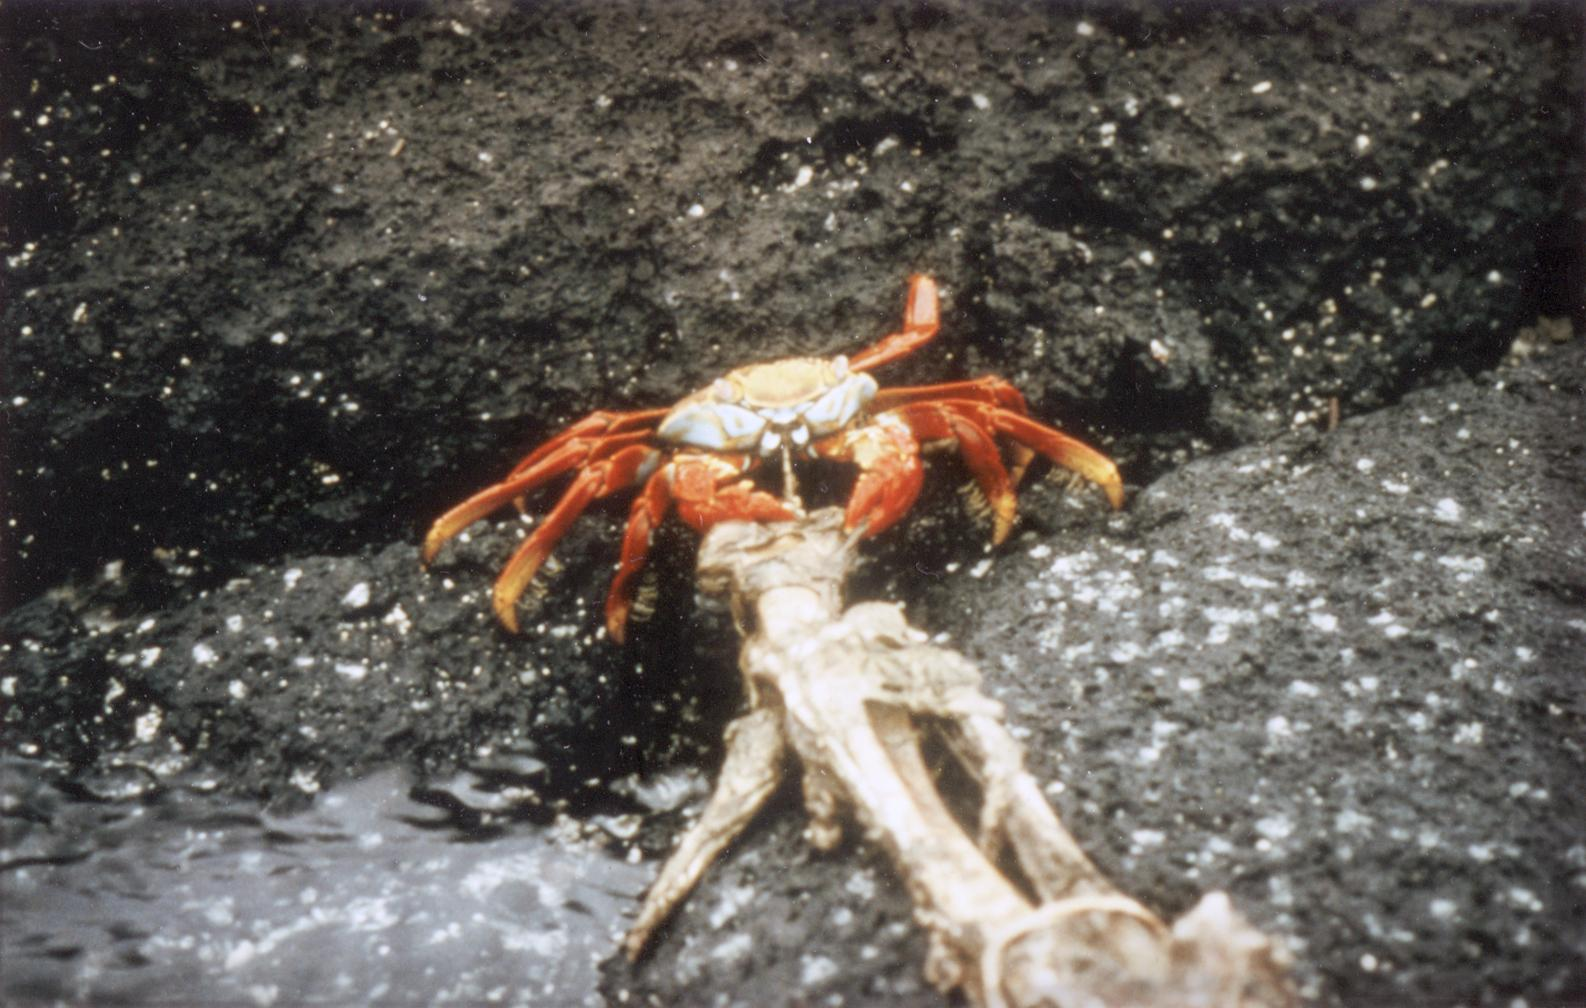 Sally Lightfoot Crab (Grapsus grapsus) and limb of Galápagos Sea Lion (Zalophus wollebaeki)